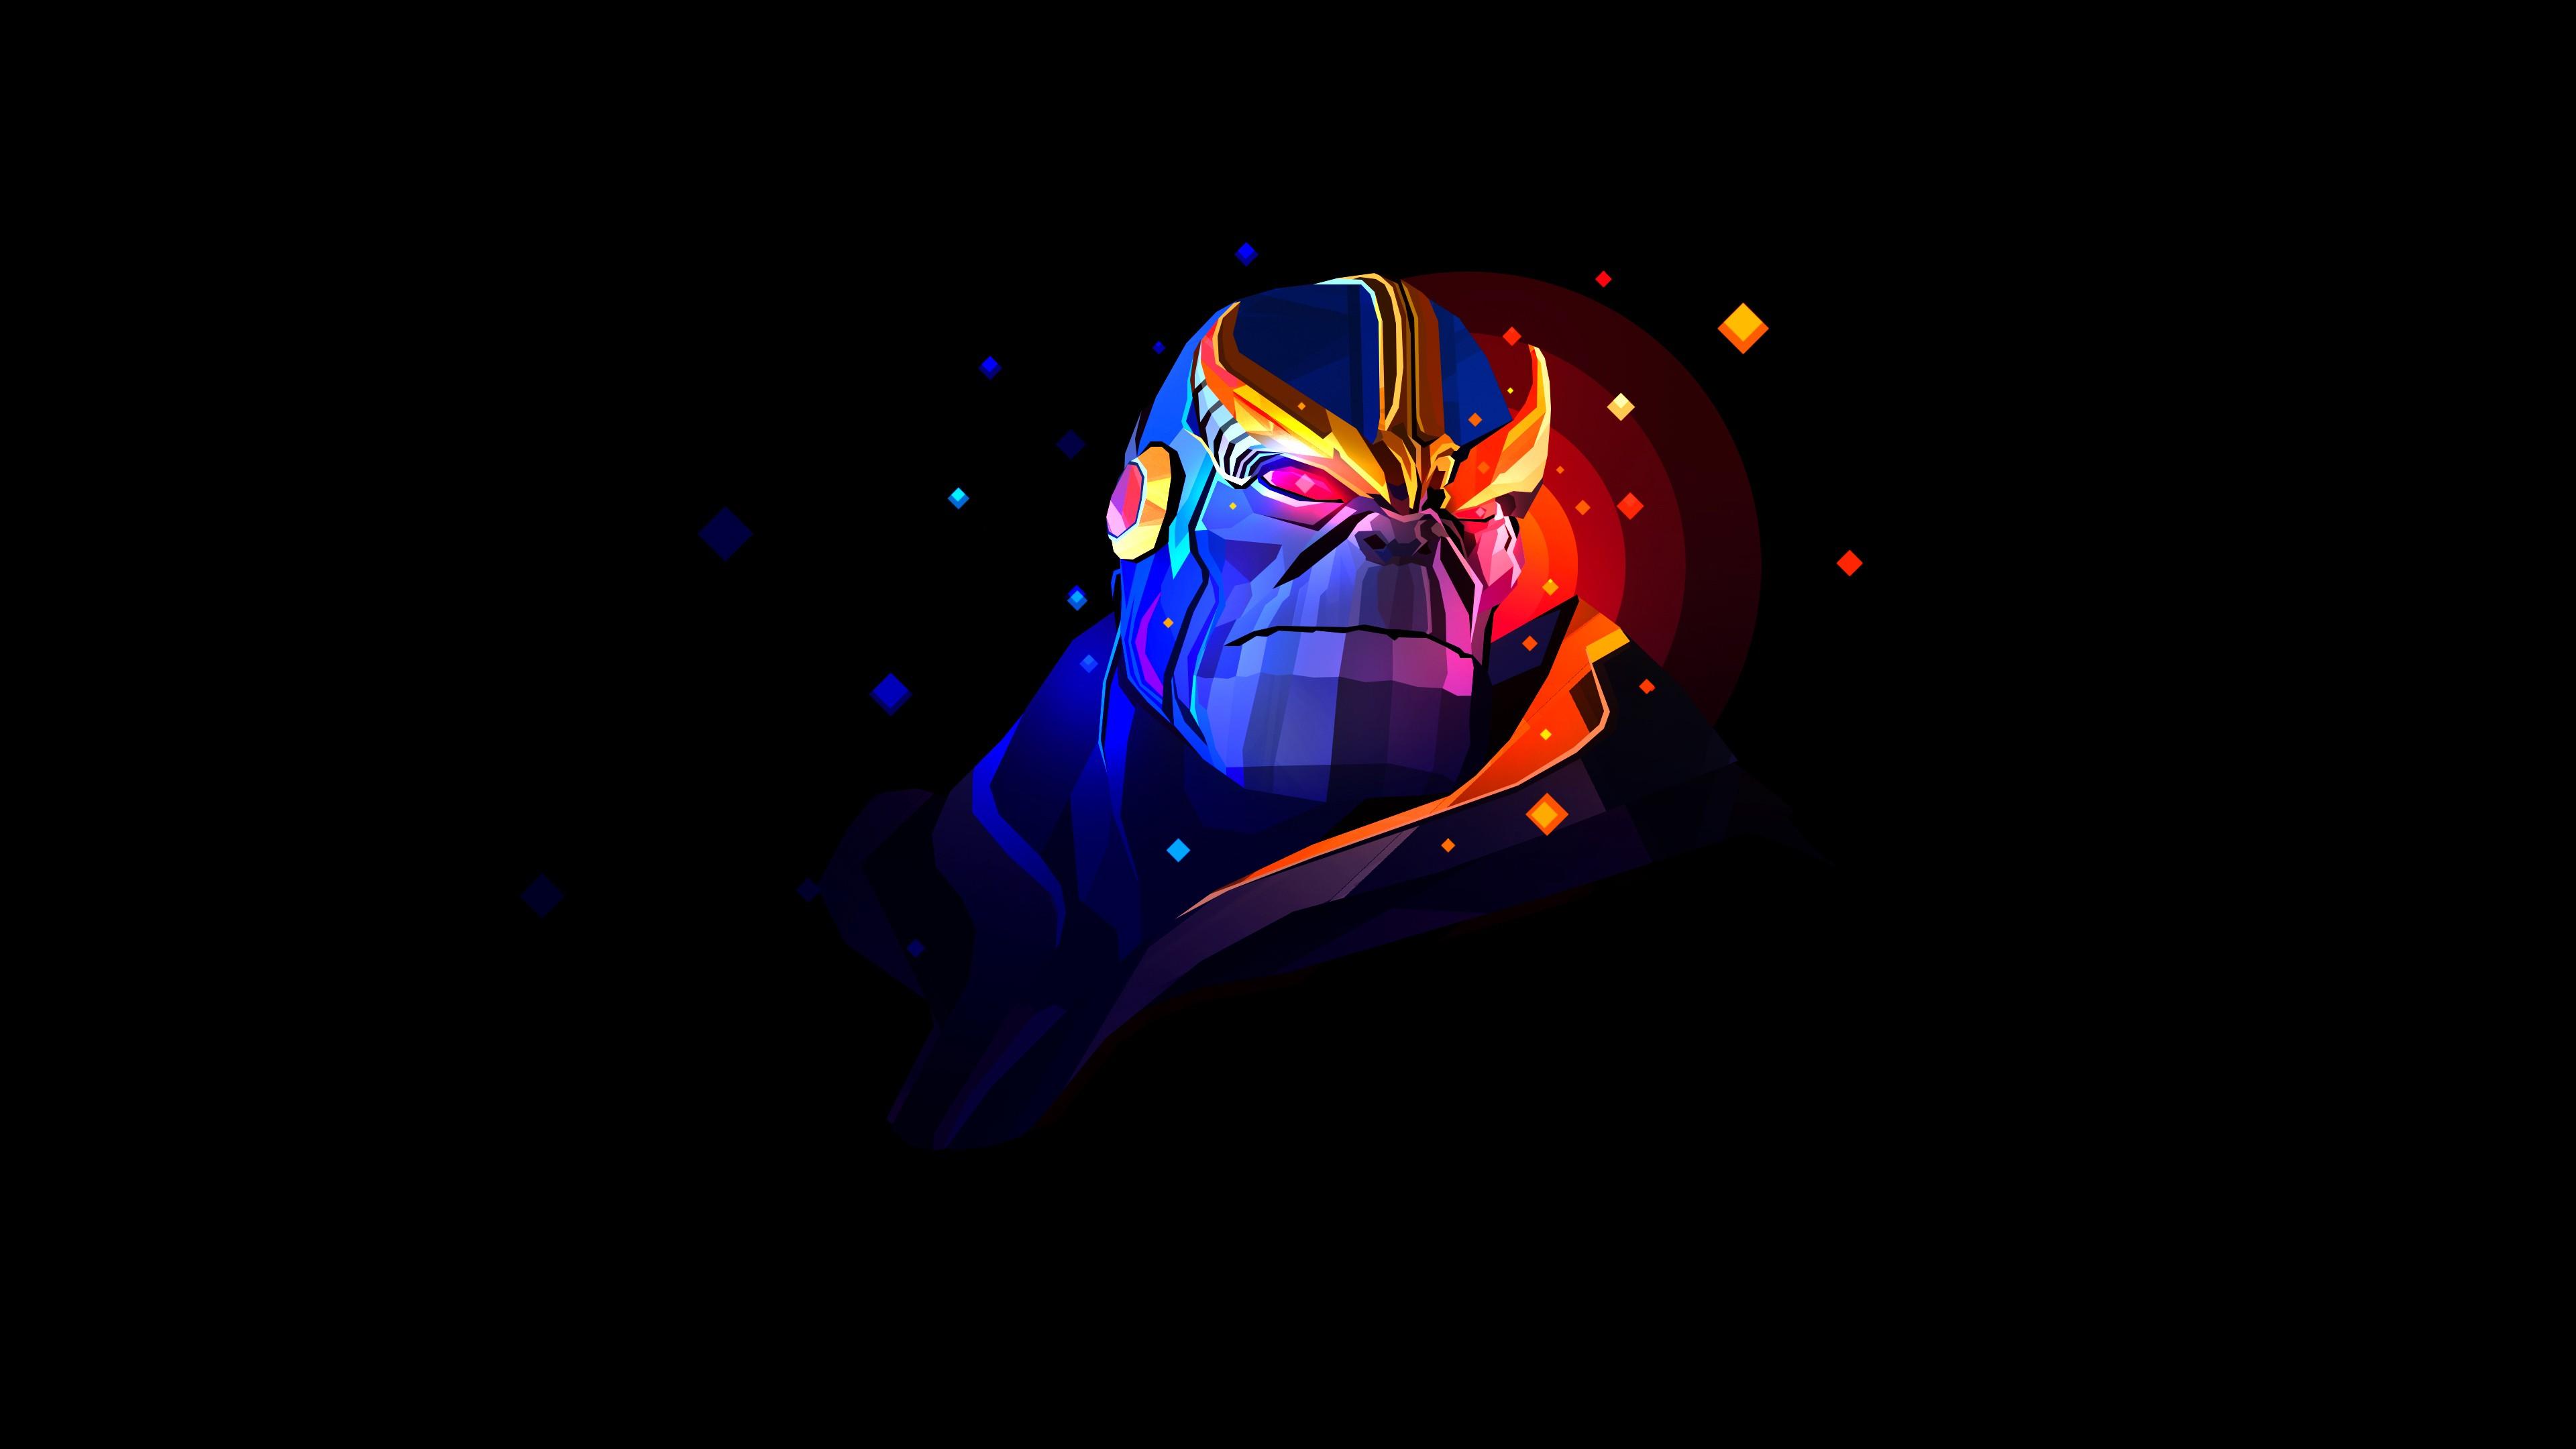 Thanos Wallpaper Iphone X Thanos Minimal Artwork 4k Wallpapers Hd Wallpapers Id